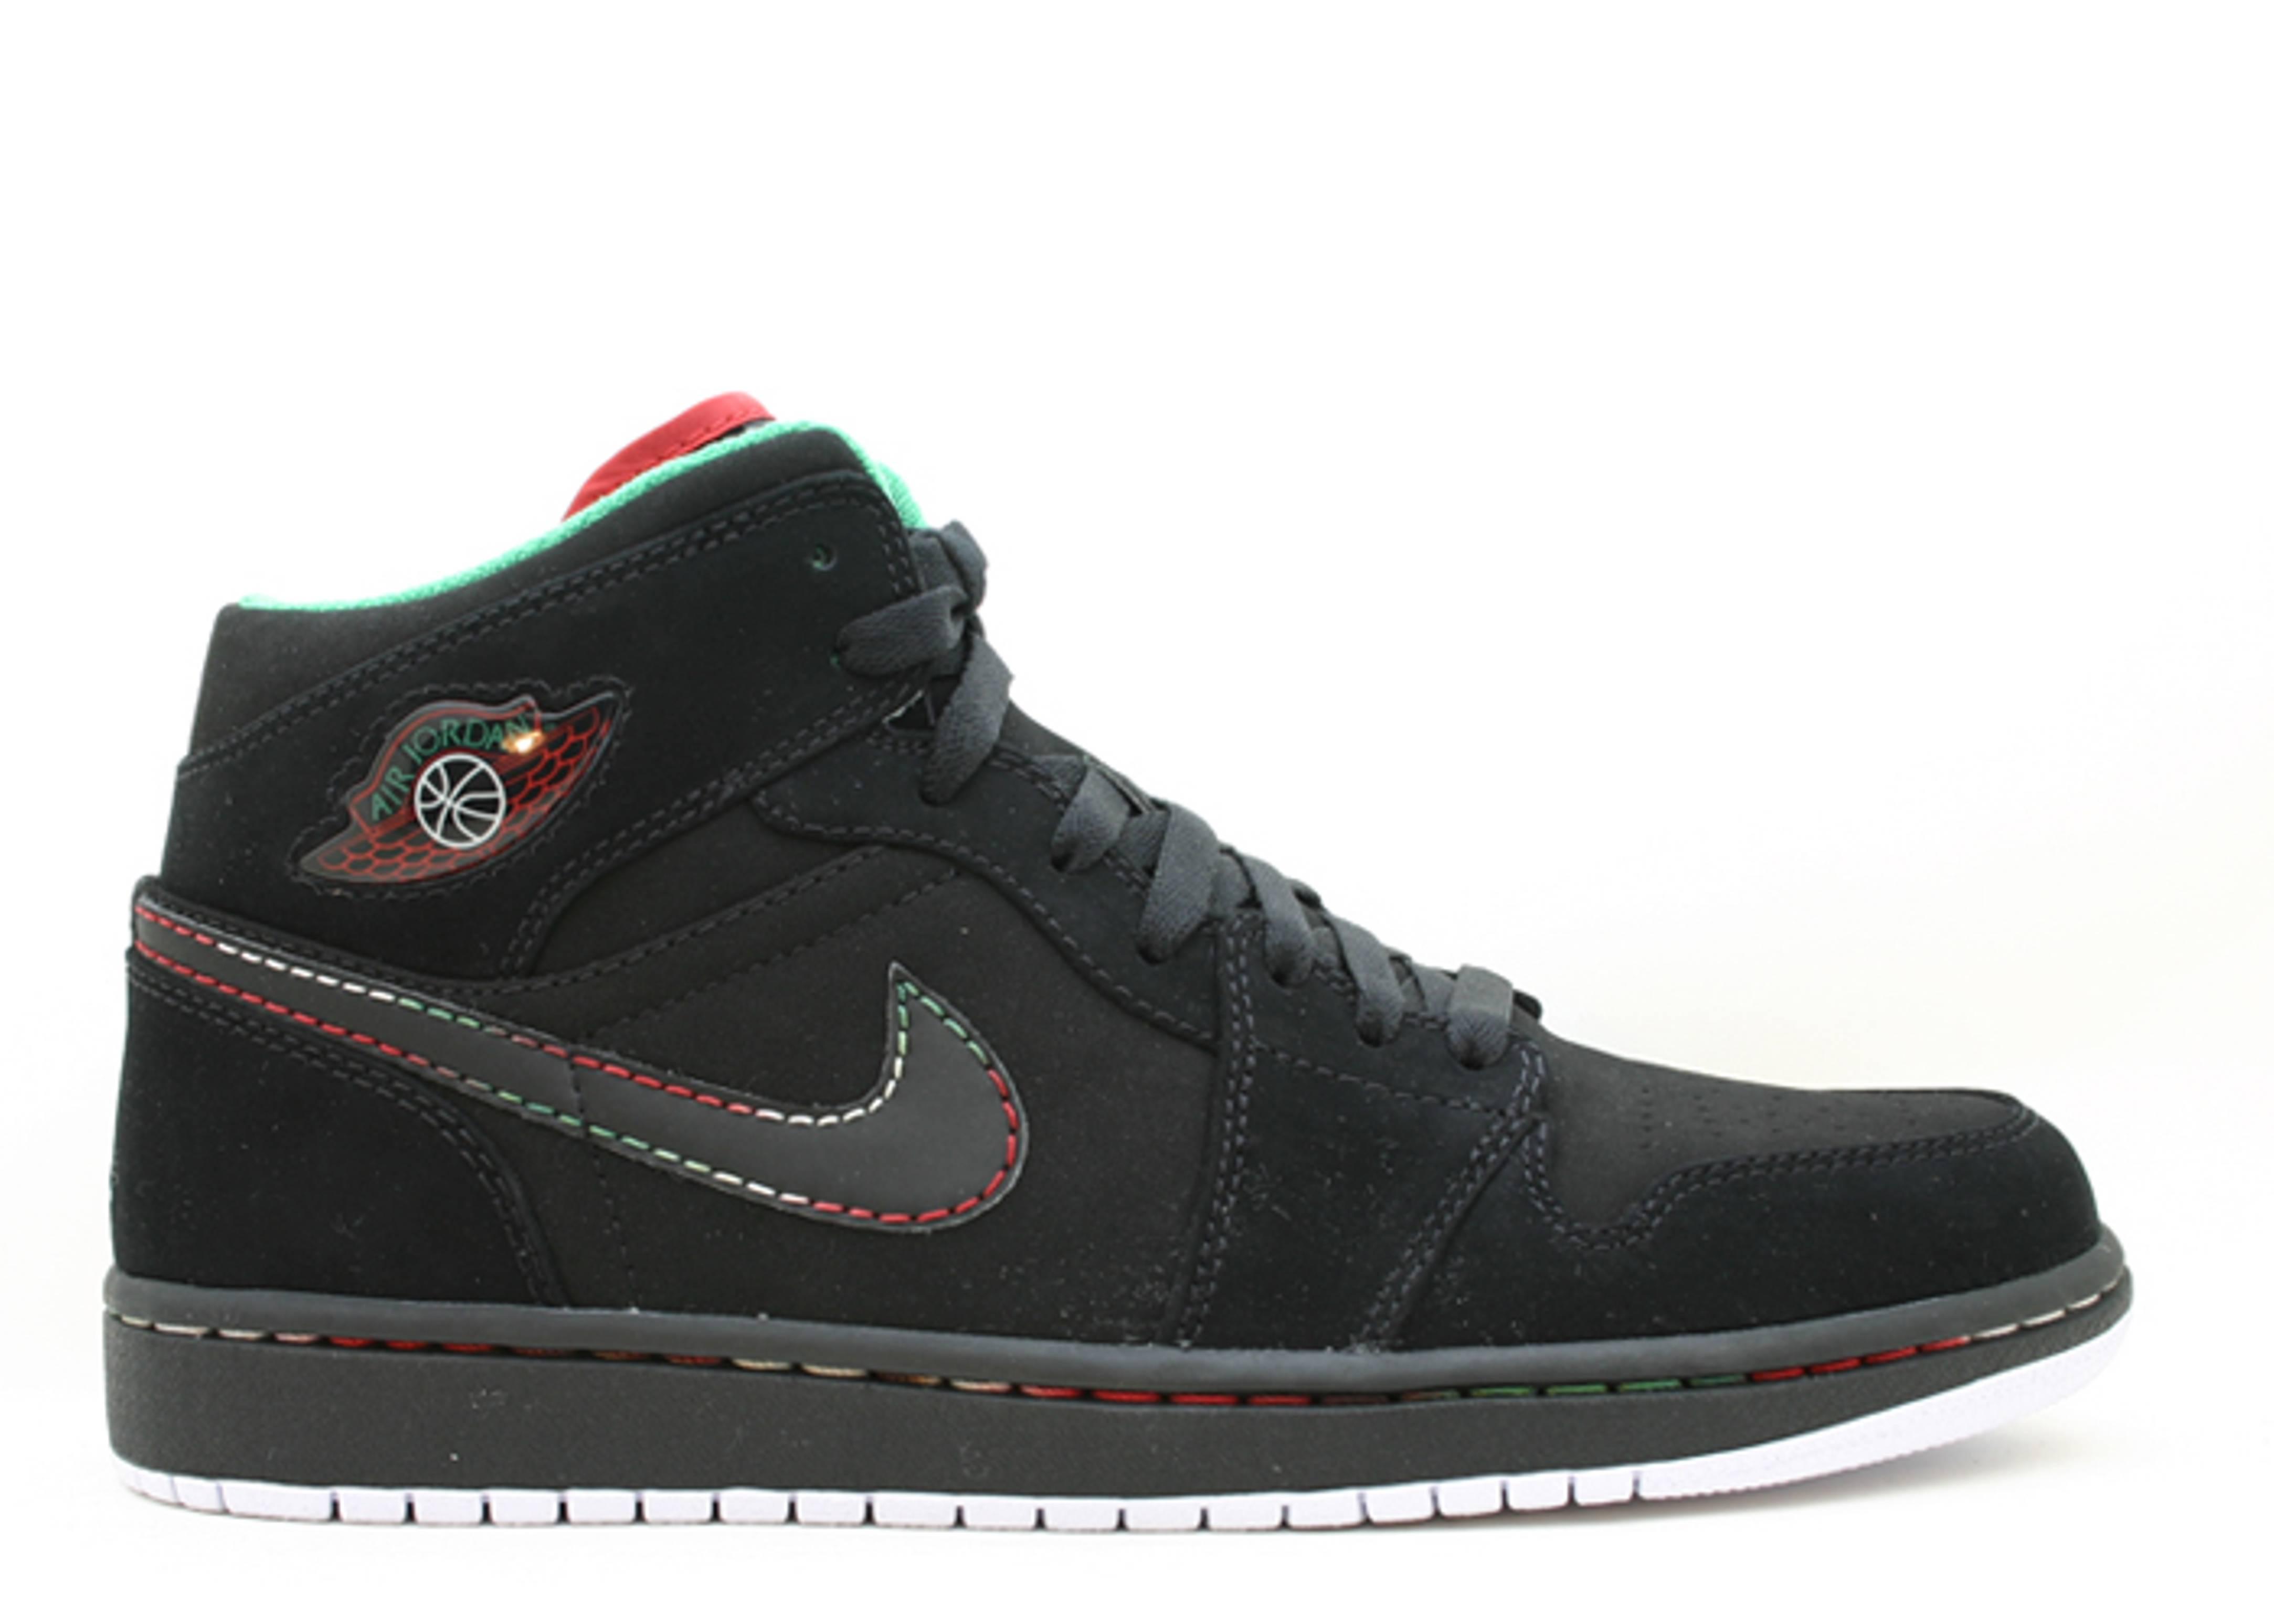 separation shoes 52997 2f5aa air jordan 1 retro